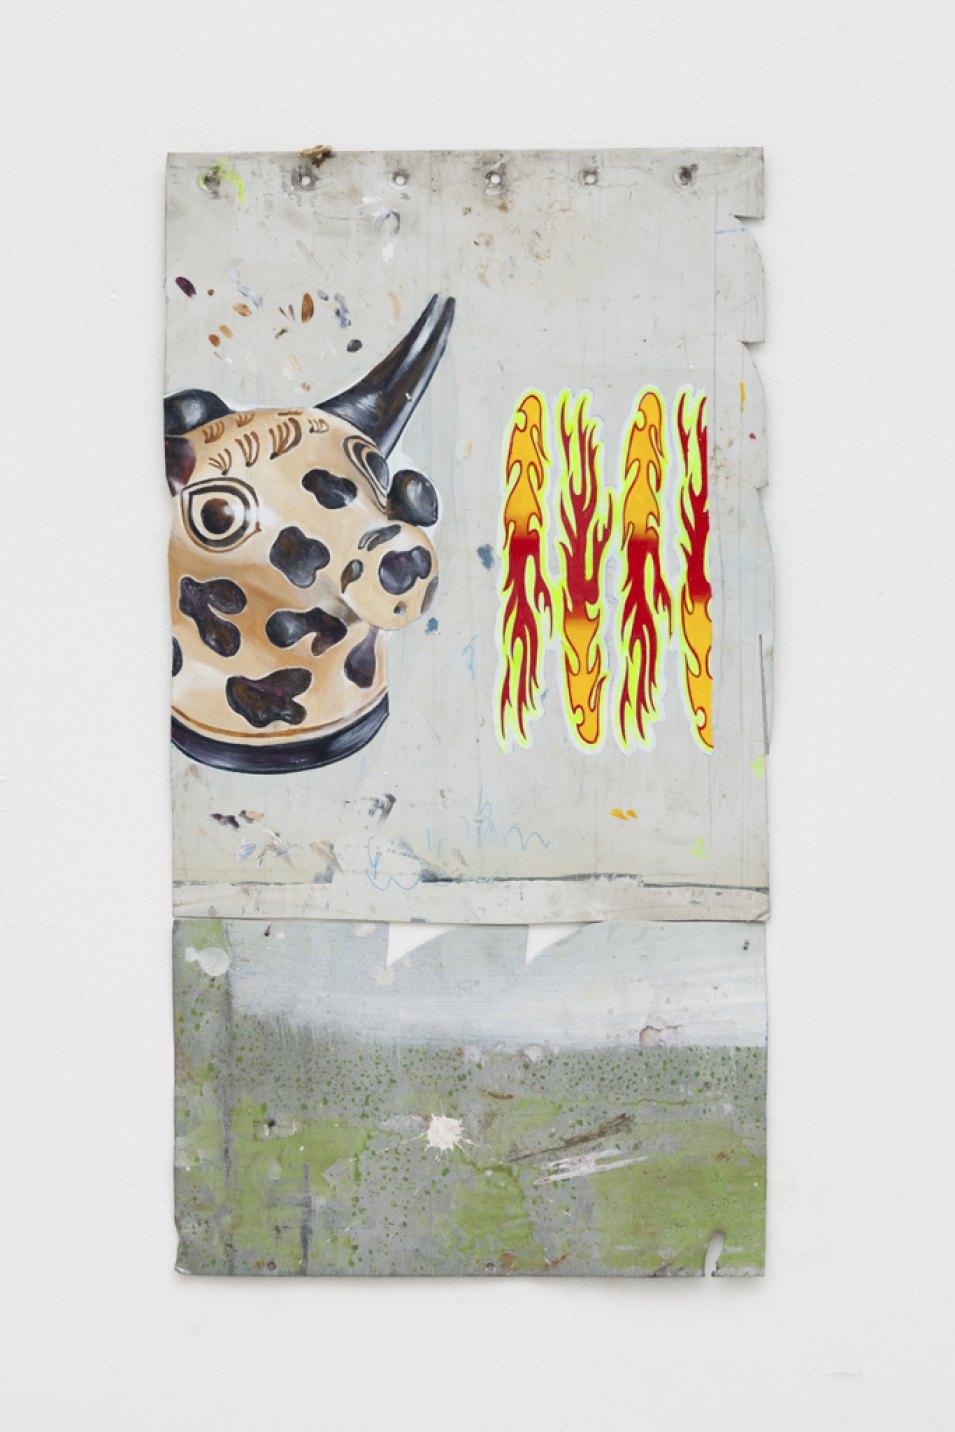 Paulo Nimer Pjota, <em>War</em>, 2017, acrylic on iron, 60 × 30 cm - Mendes Wood DM